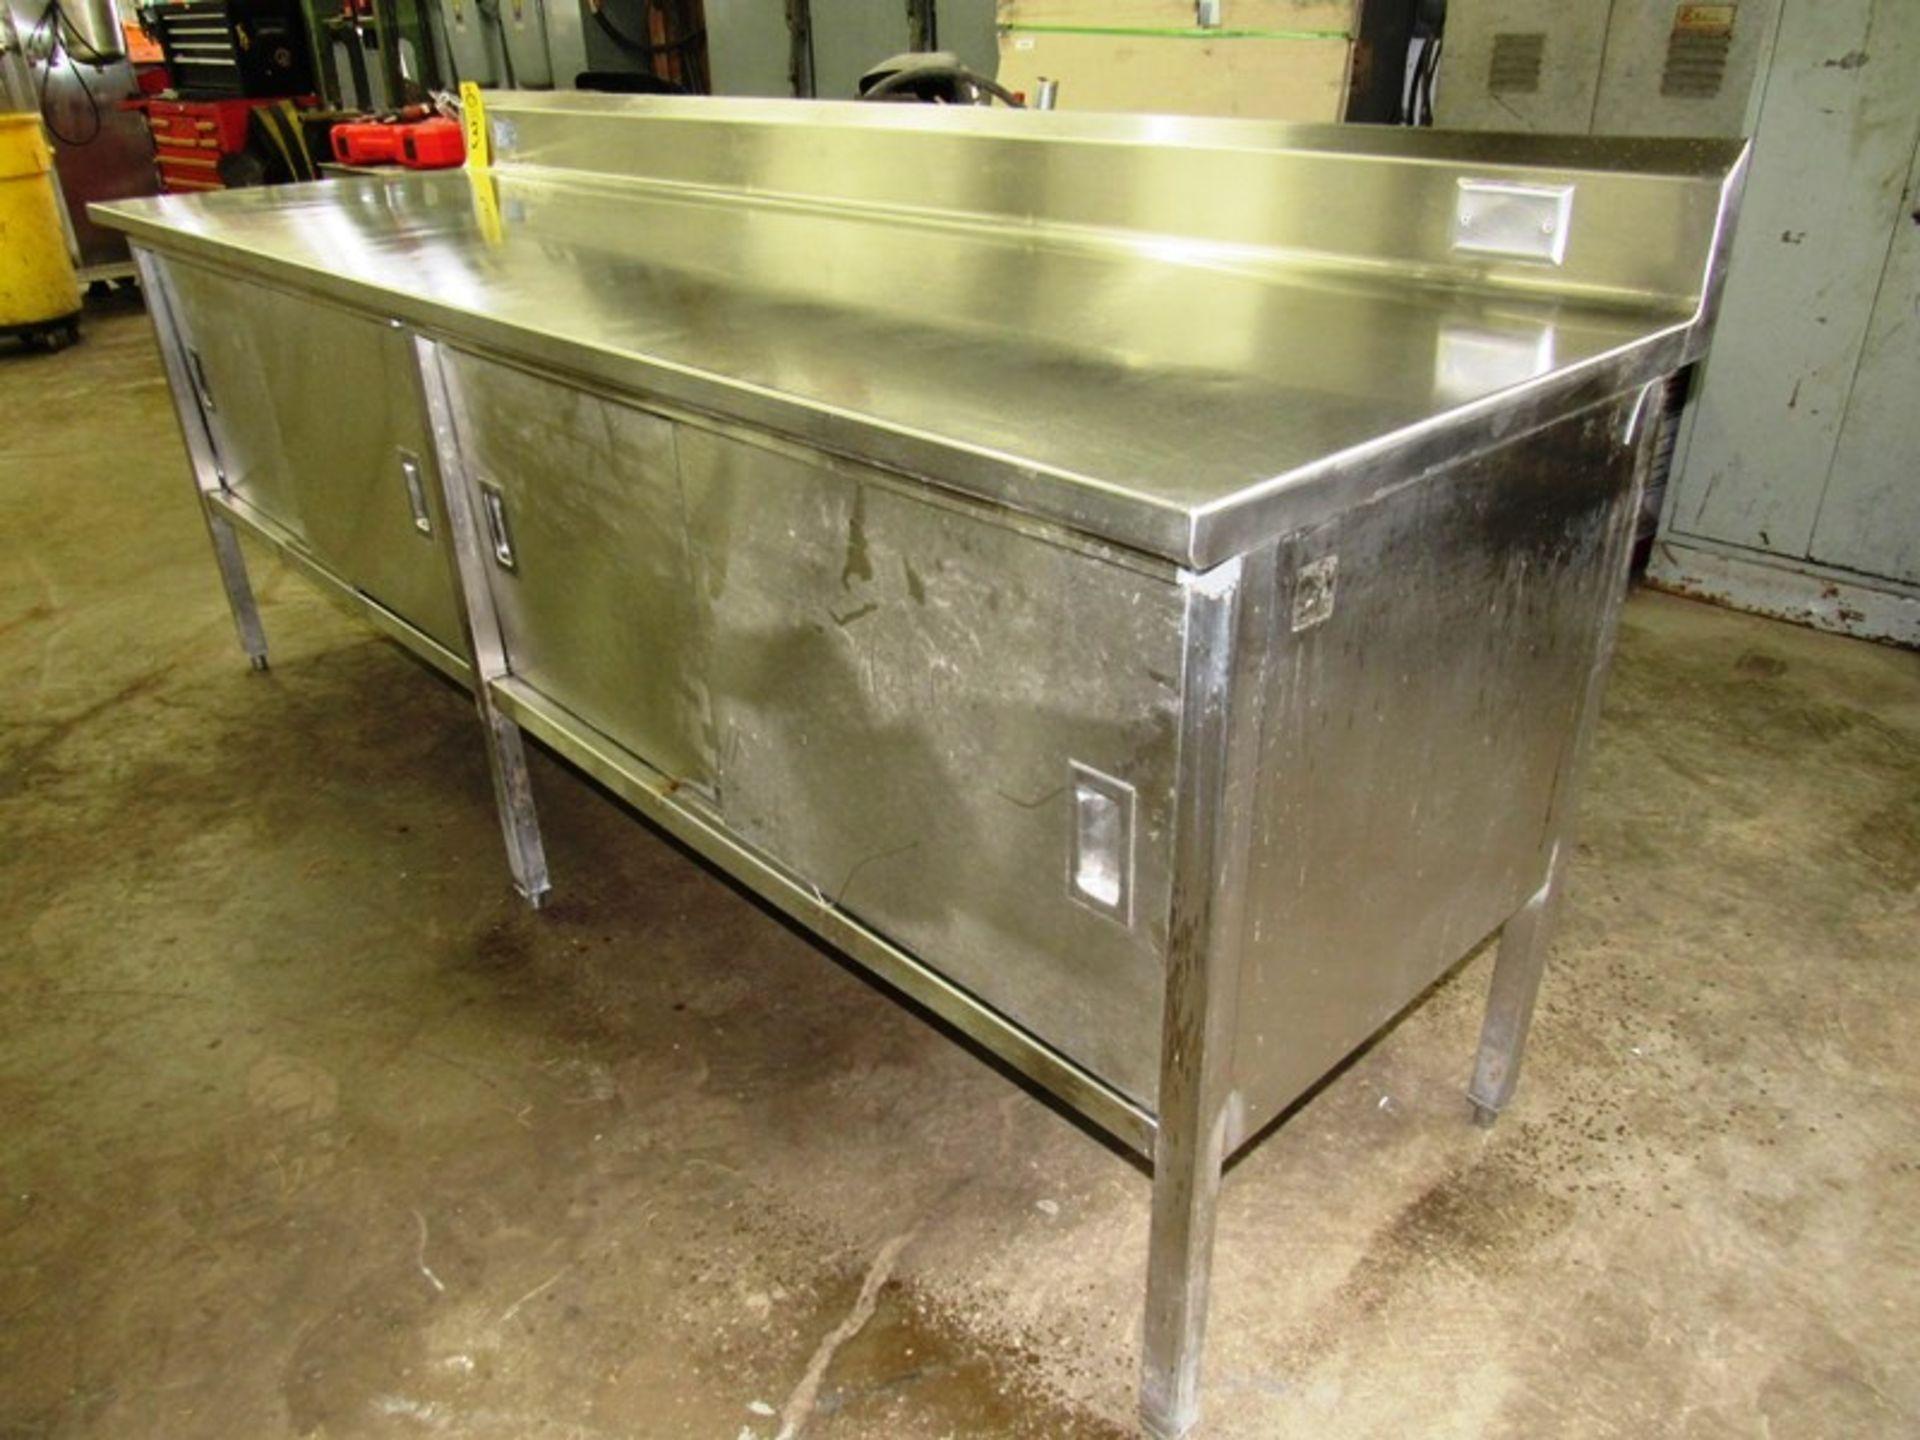 "Stainless Steel Cabinet, 30"" W X 8' L X 36"" T, (4) sliding doors, 6"" backsplash - Image 2 of 4"